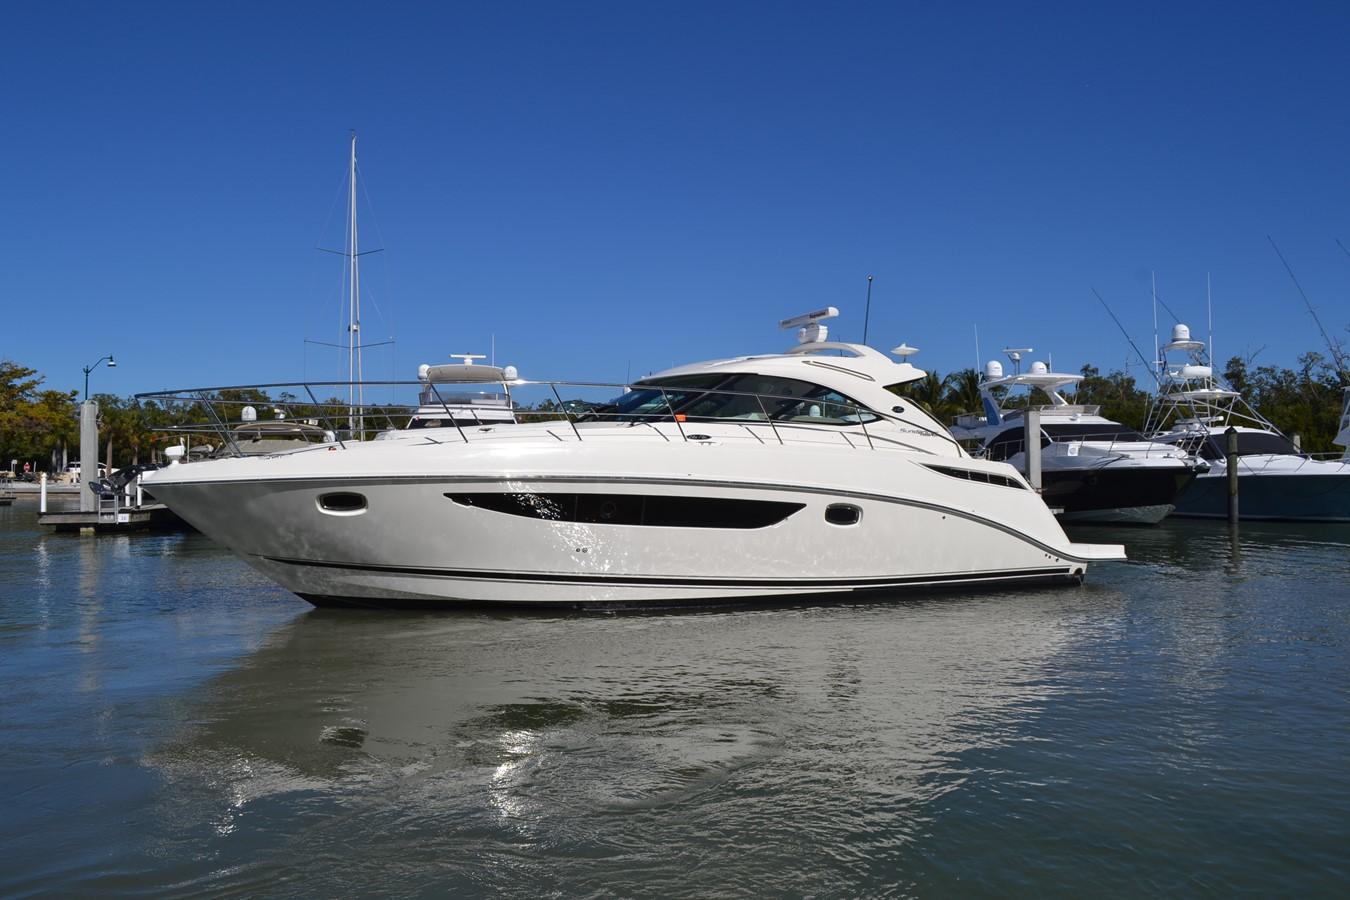 Profile Port Side 2015 SEA RAY 410 Sundancer Motor Yacht 1685721